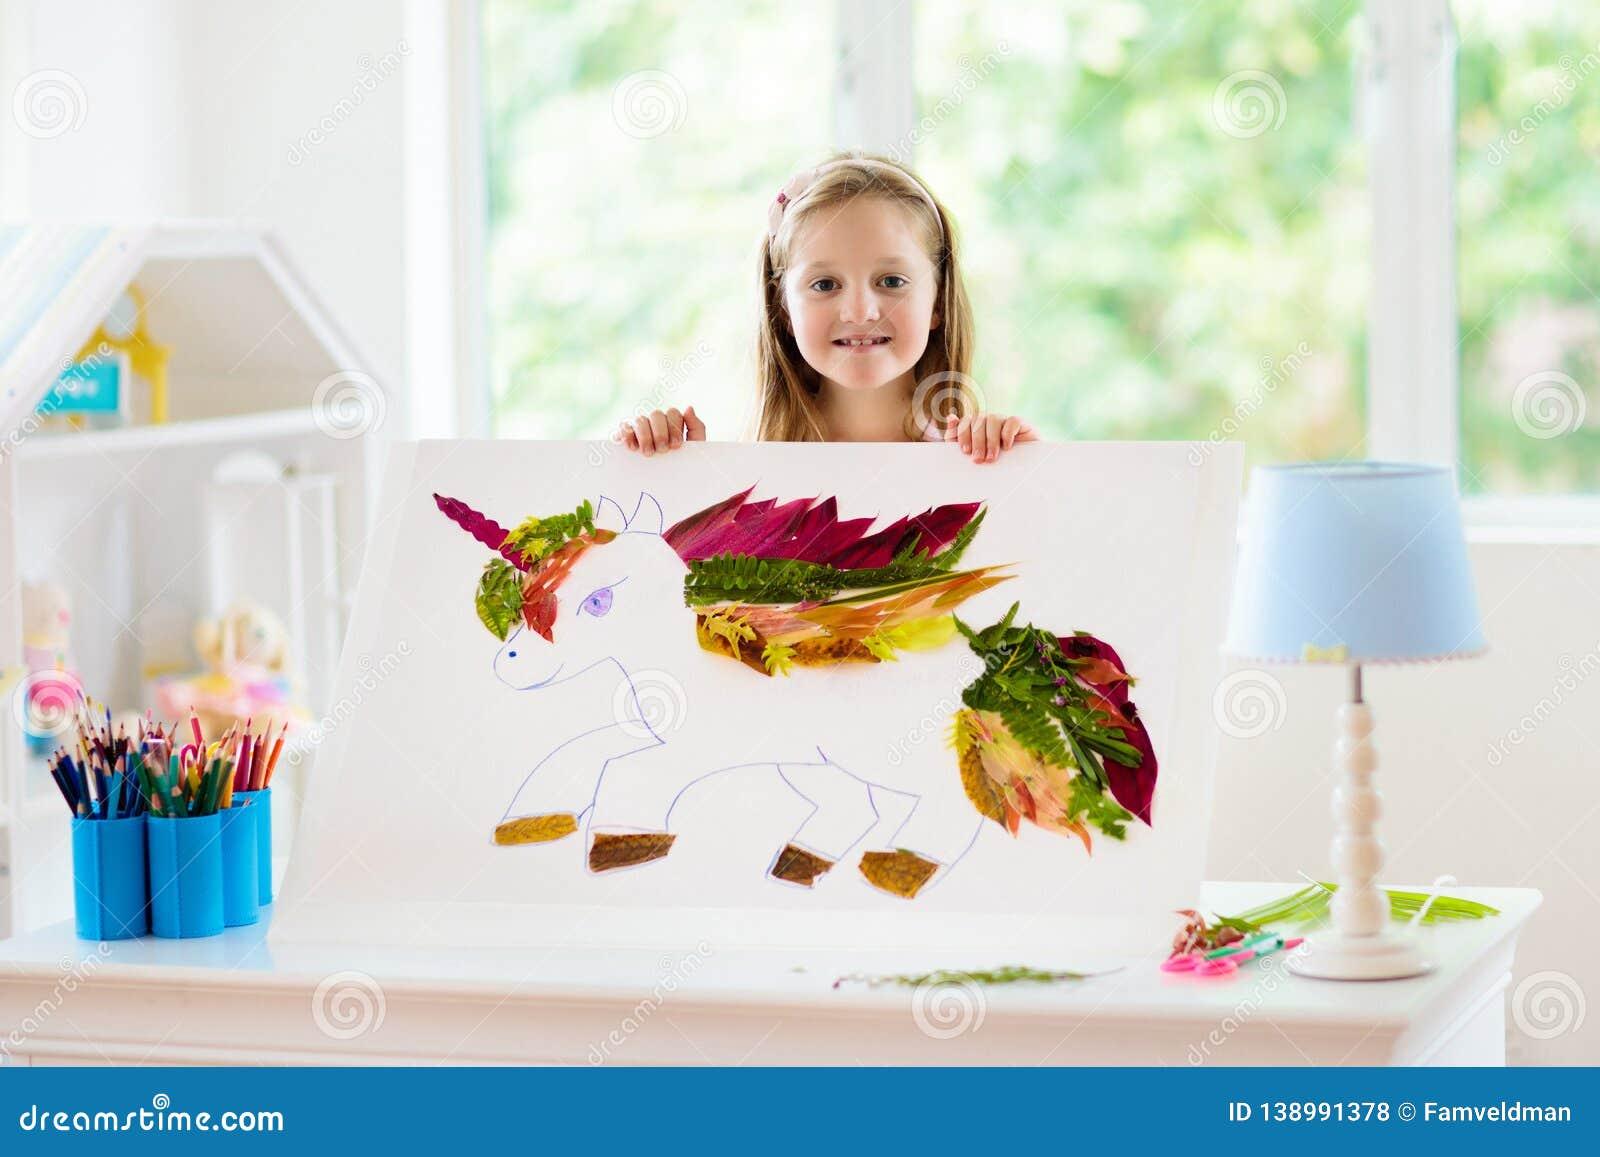 Child drawing unicorn using tree leaves